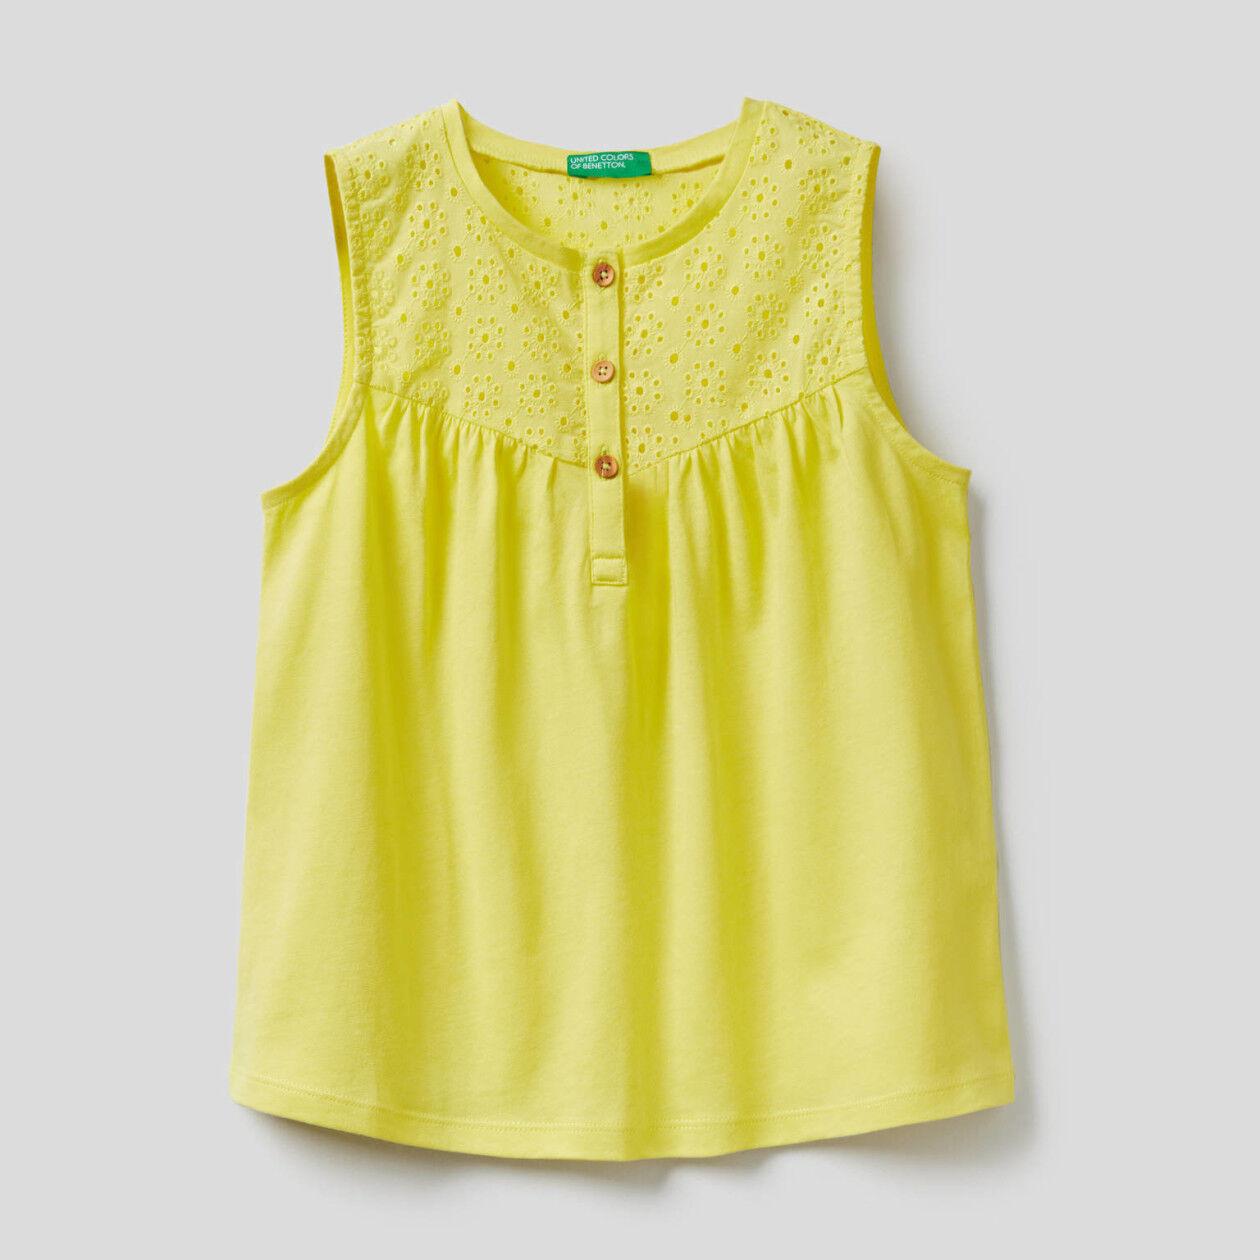 Sleeveless blouse in 100% cotton